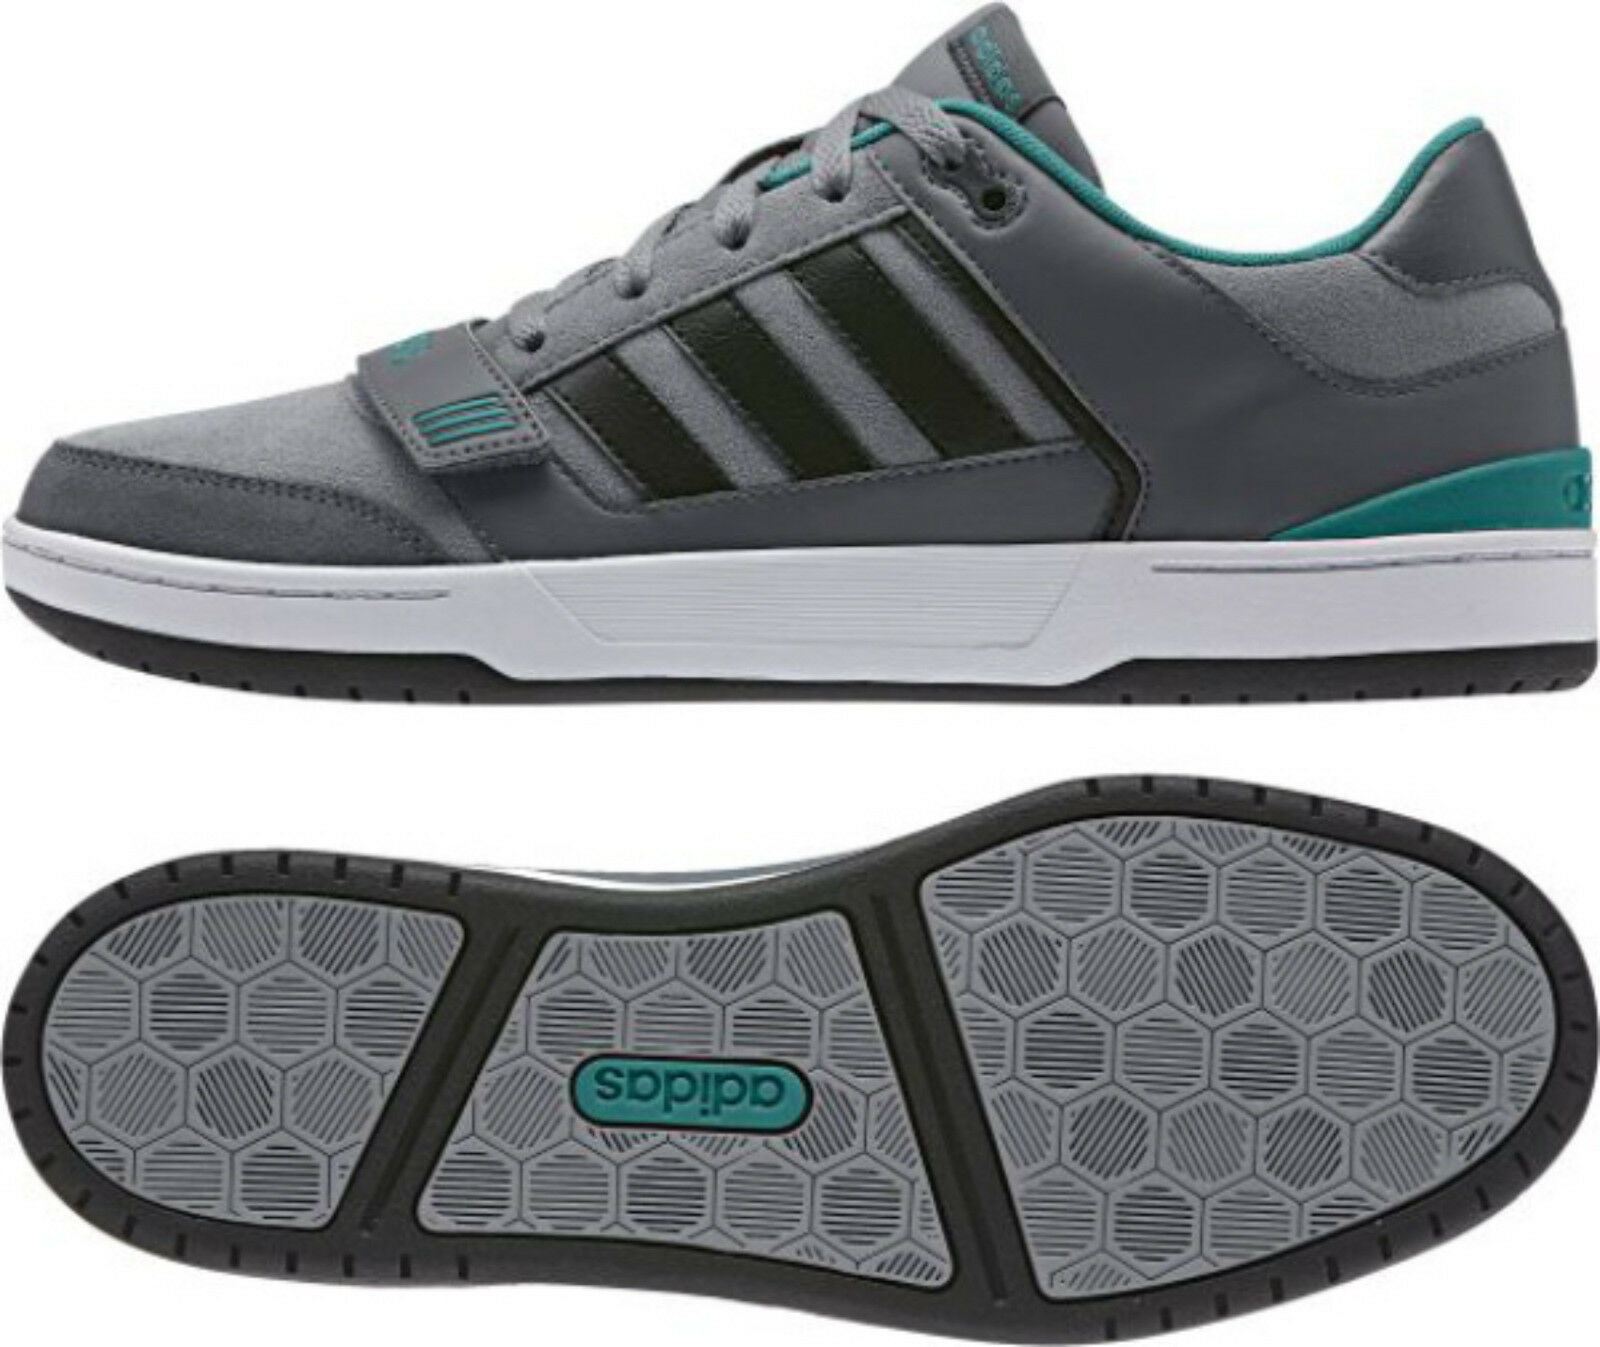 reputable site 30d54 a8289 Adidas Curb st Grey aq1504 aq1504 aq1504 Neo Basket chaussures de sport  3d4cf8